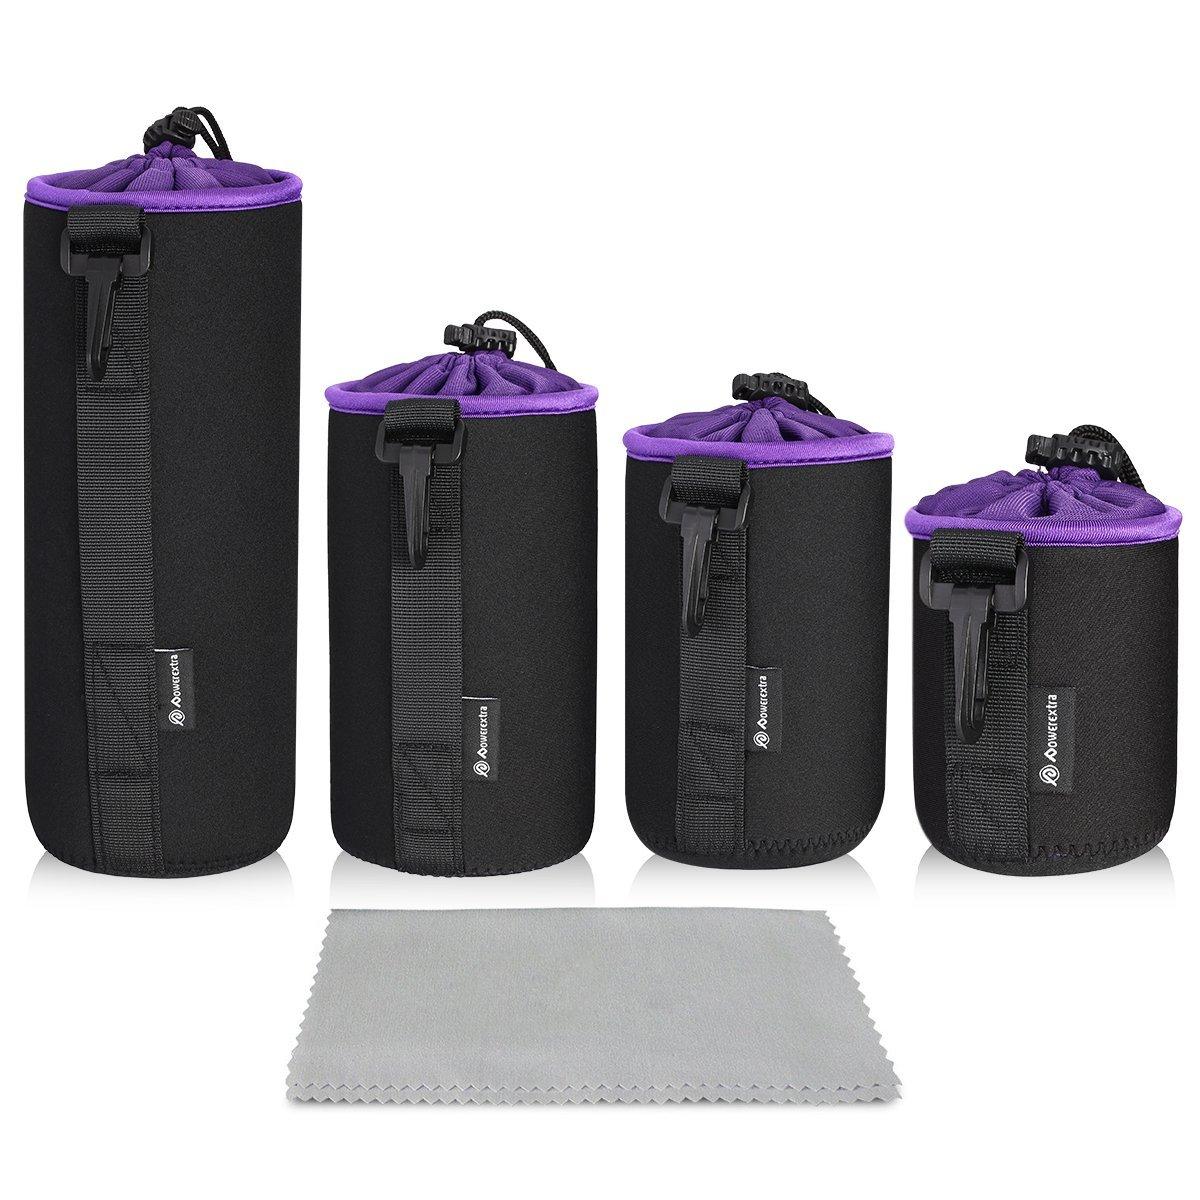 1X Neoprene Soft Camera Inner Lens Case Pouch Bag for Canon Camera FO